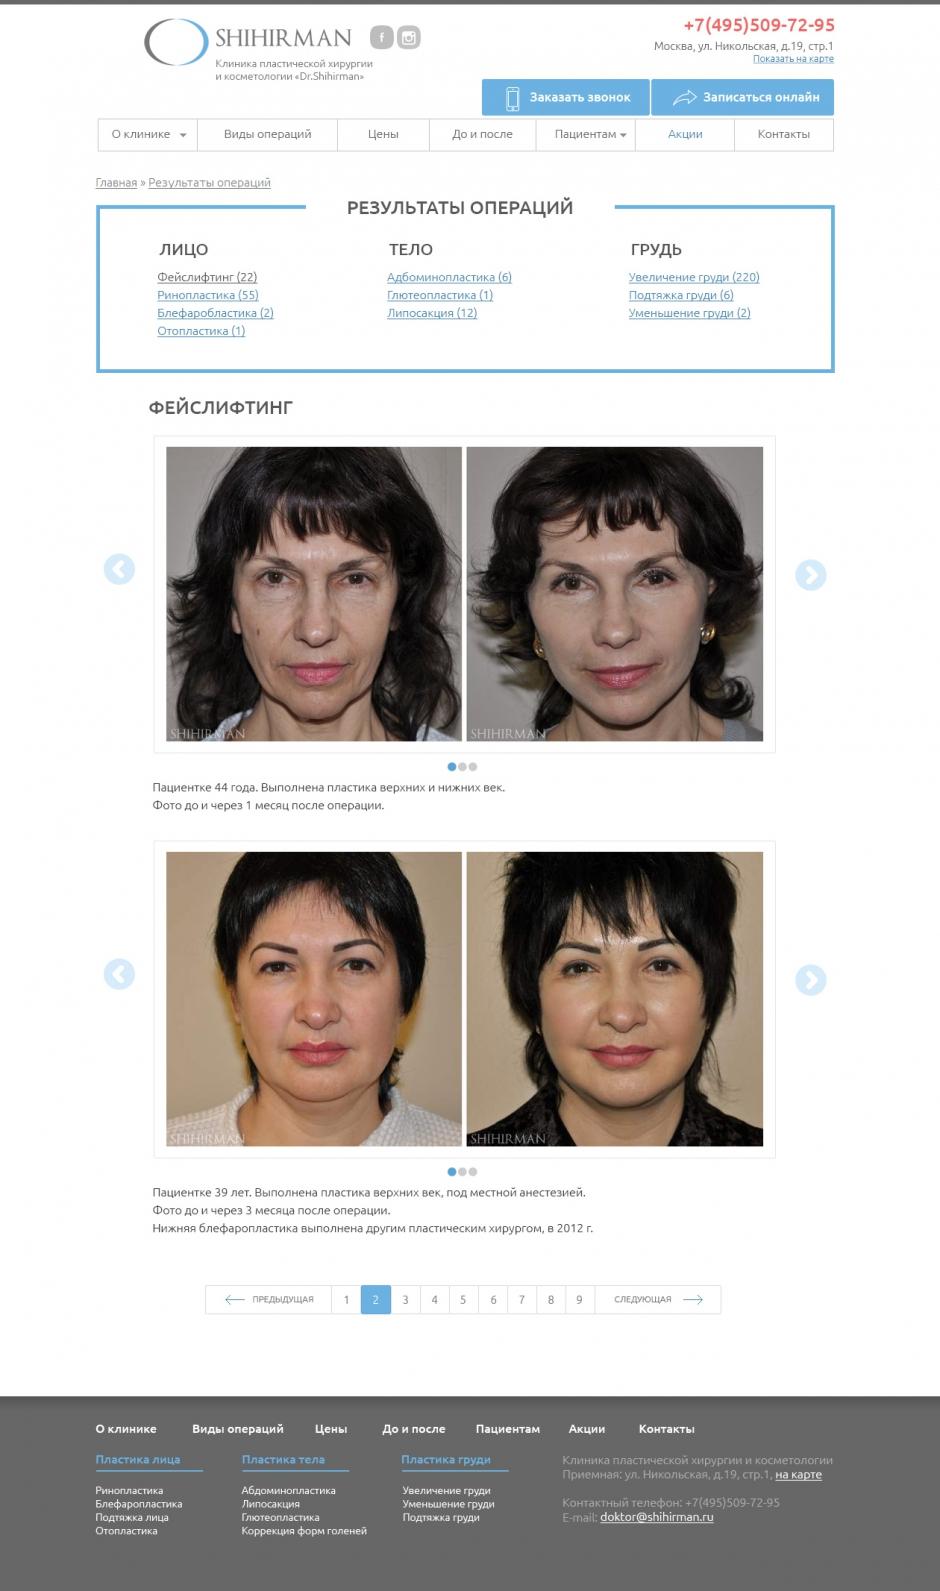 сайт клиника пластической хирургии и косметологии Dr. Shihirman